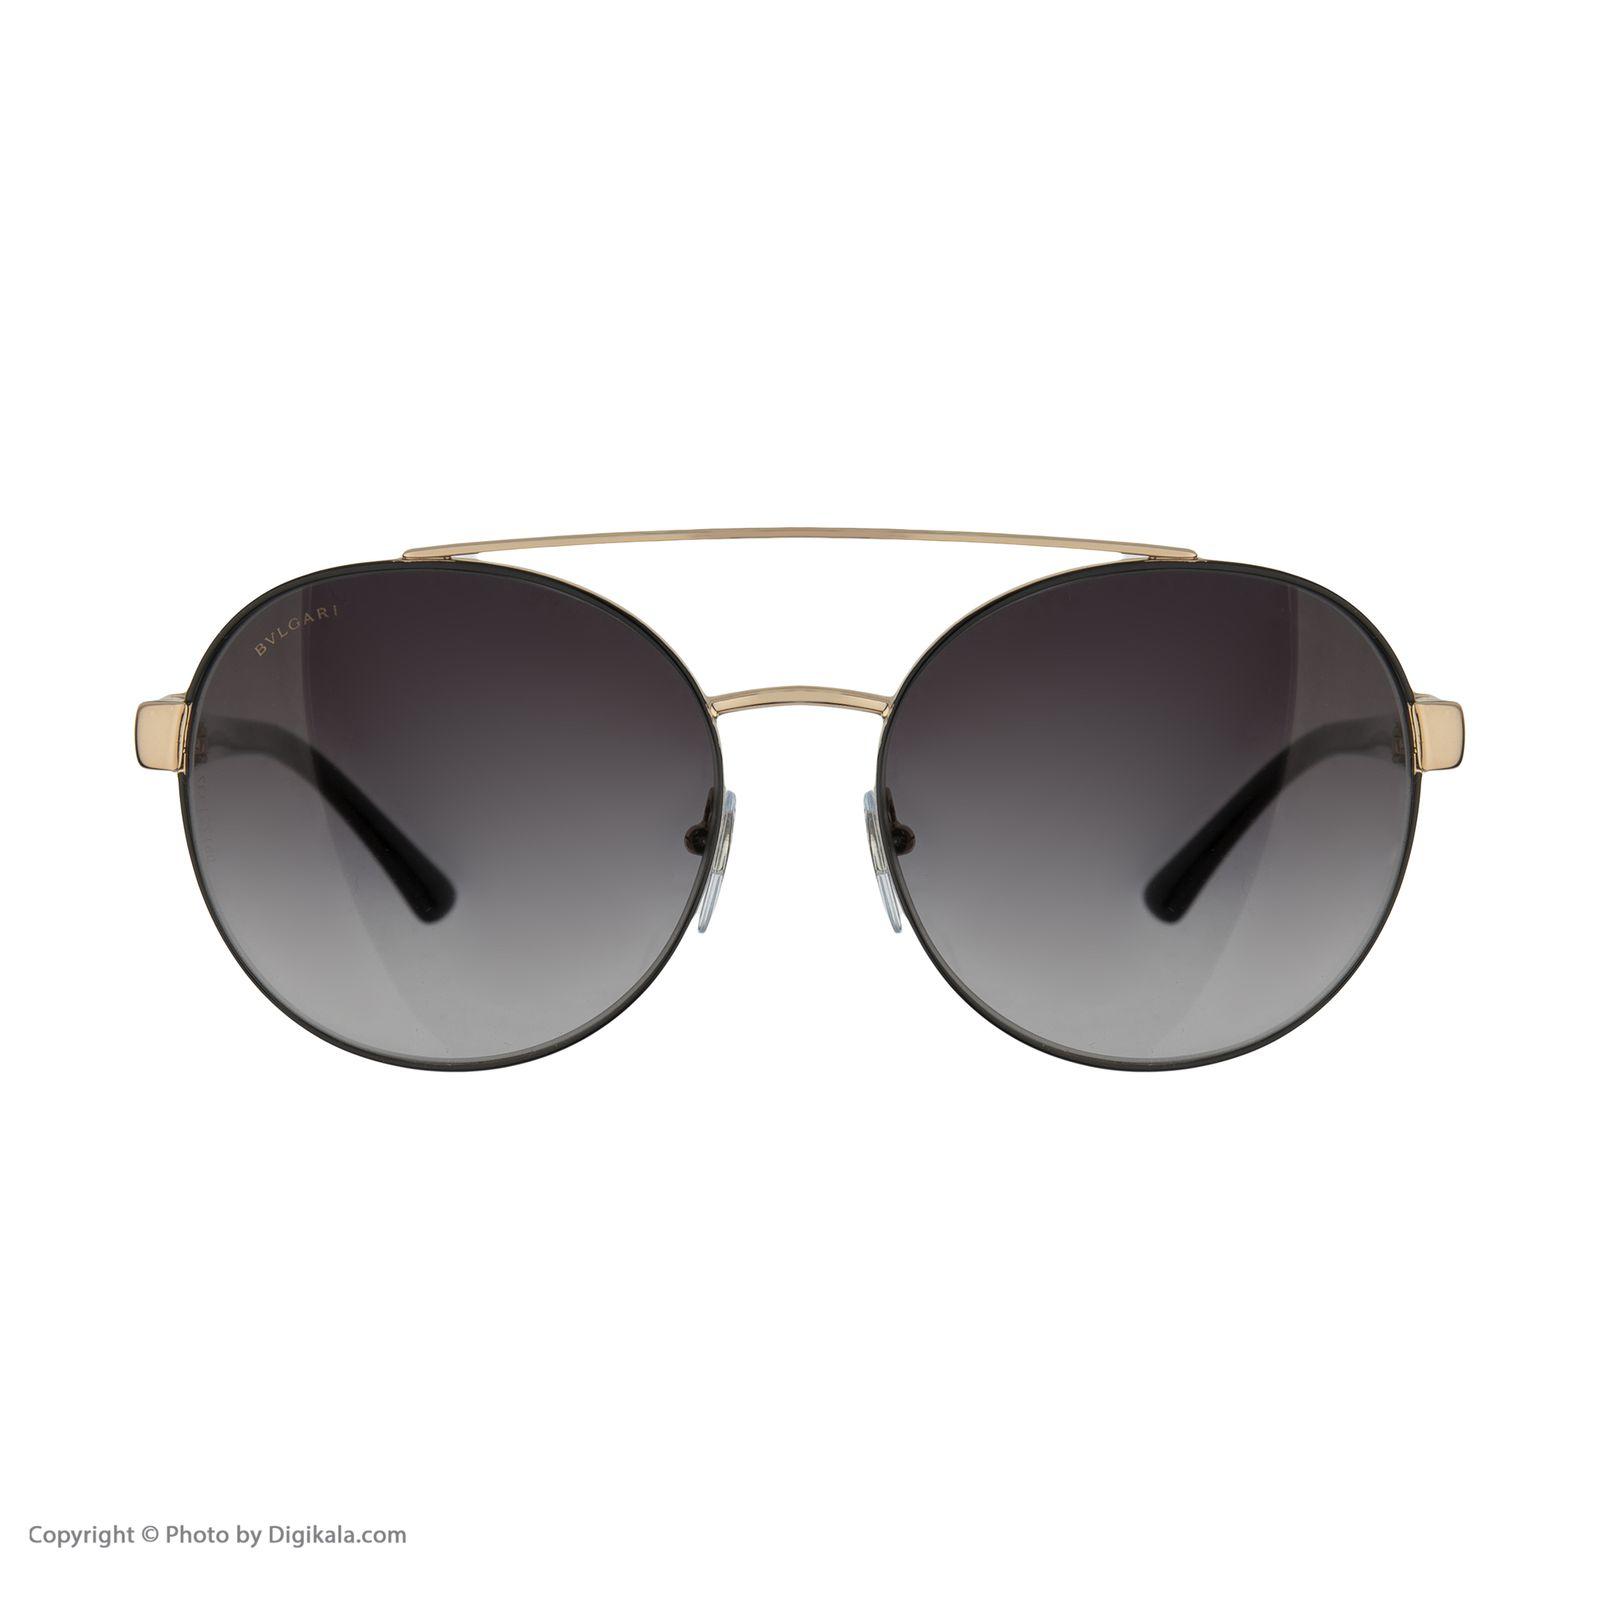 عینک آفتابی زنانه بولگاری مدل BV6085B 20238G -  - 3